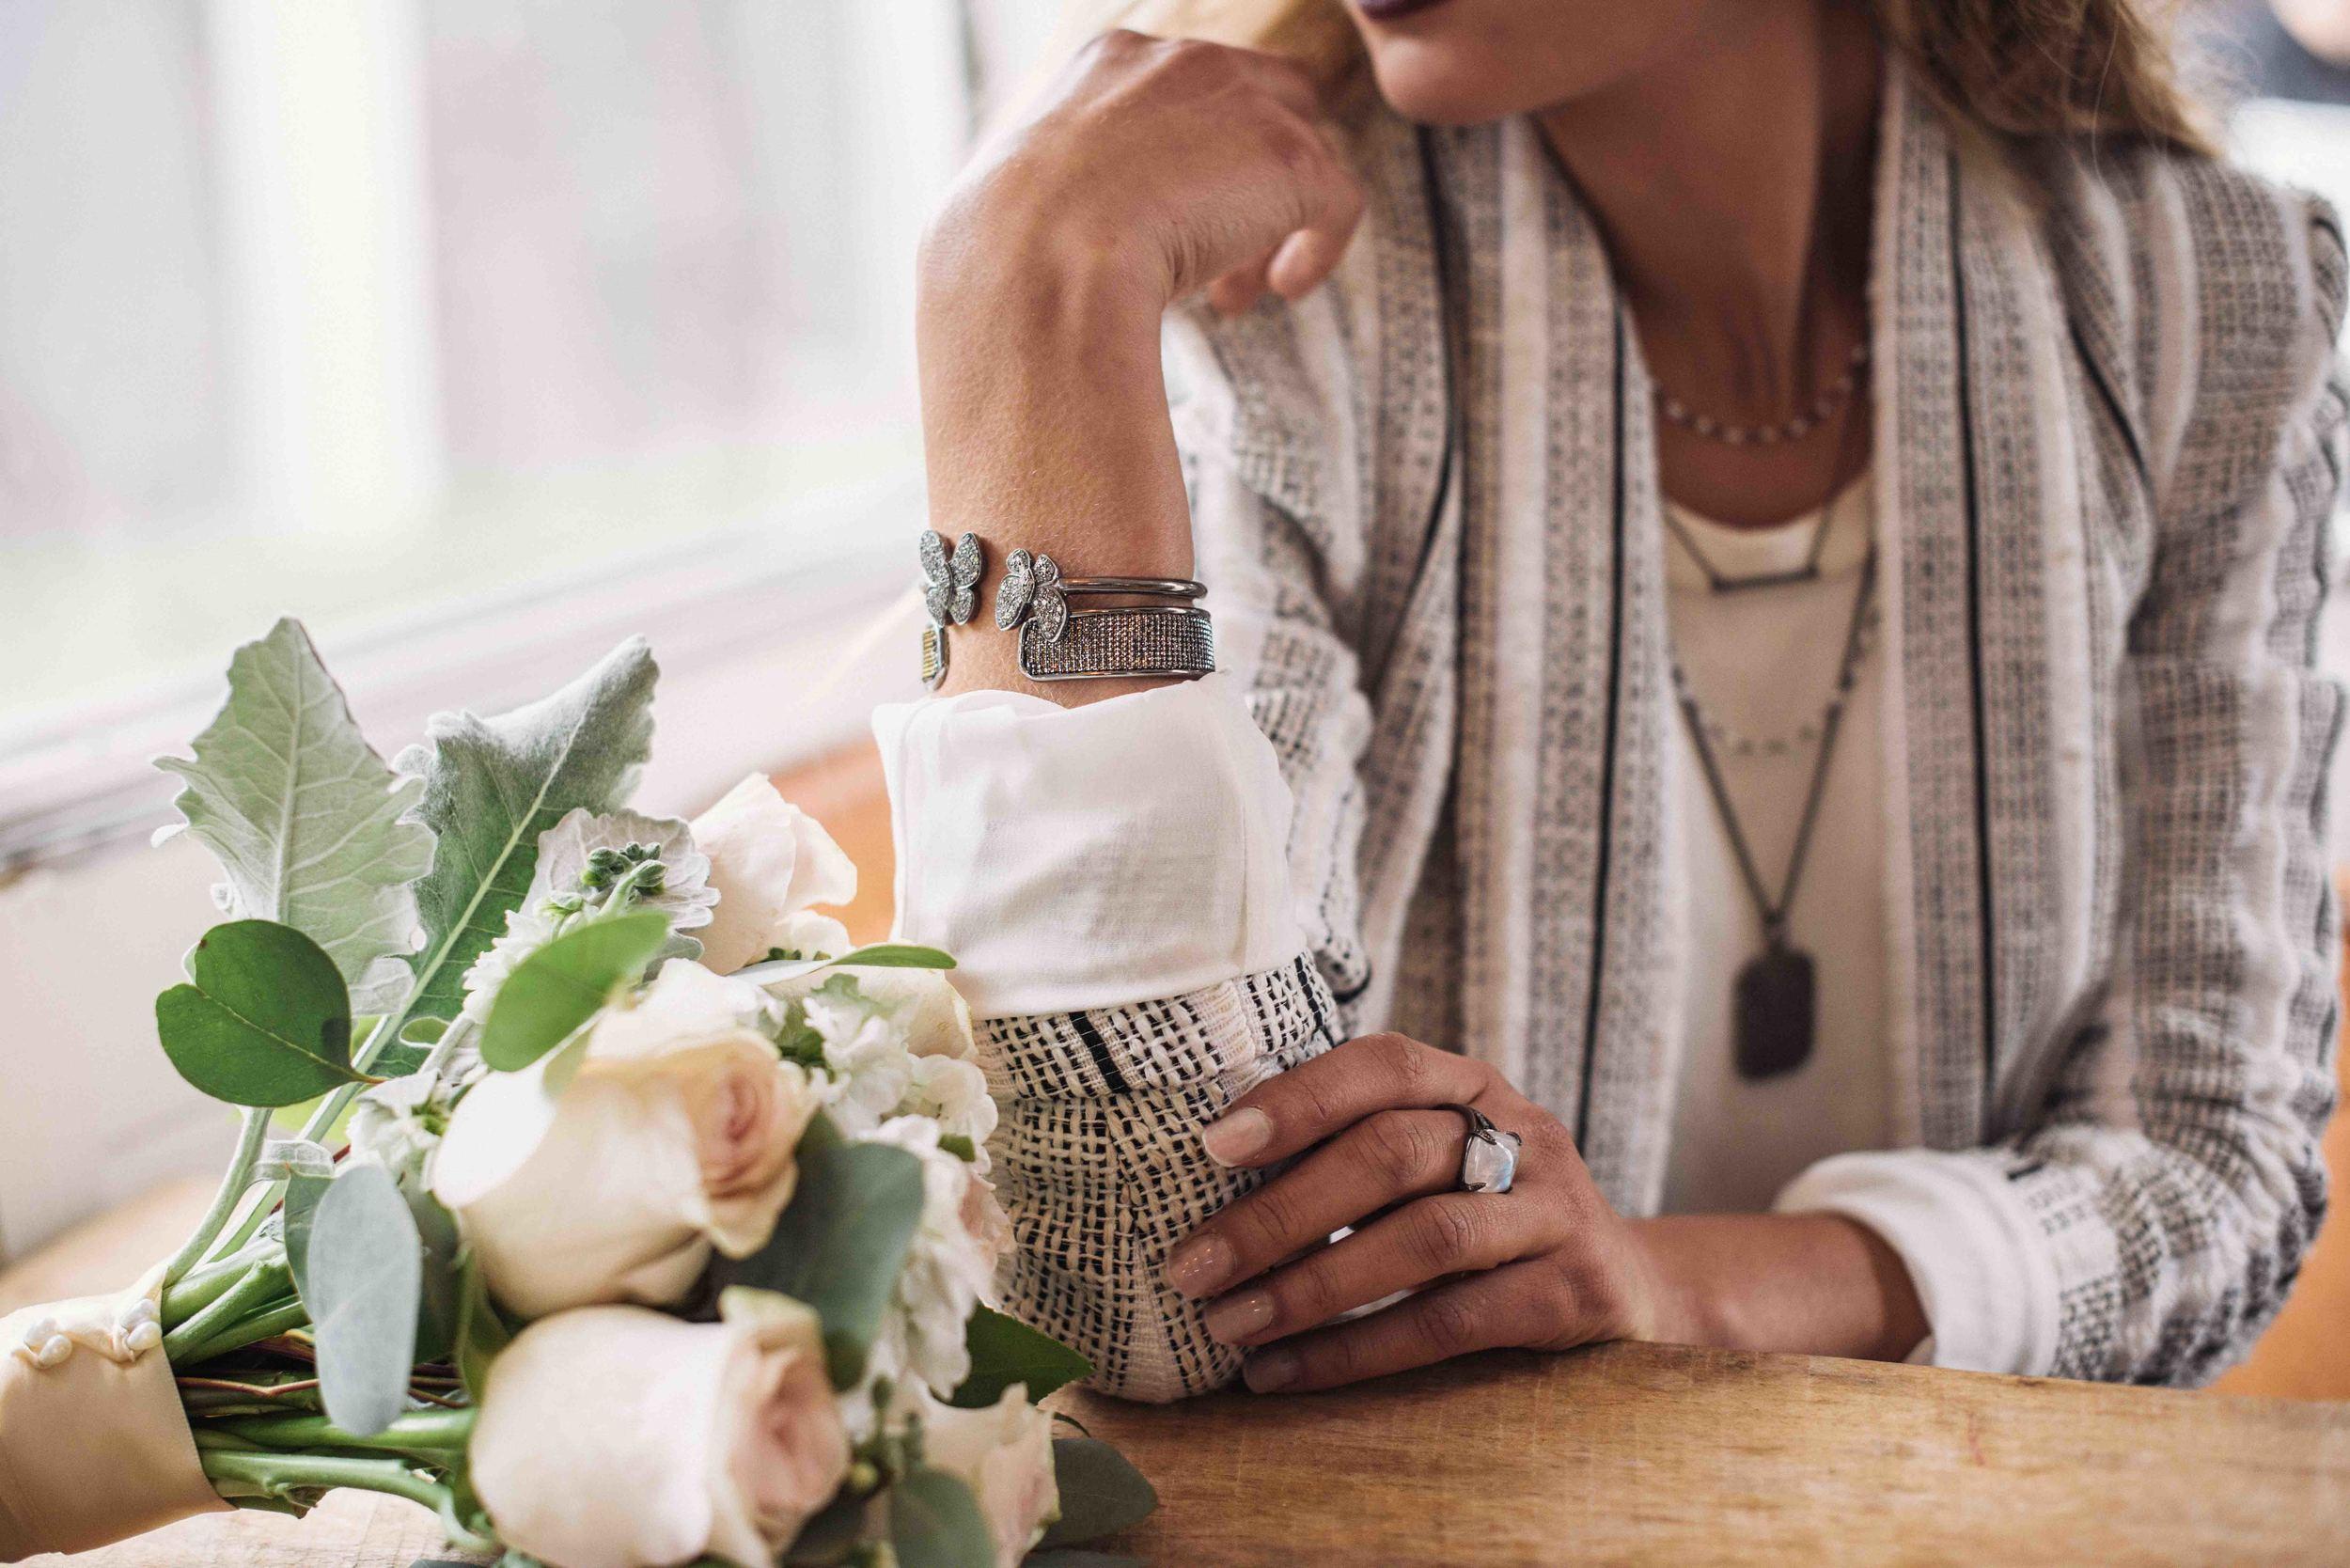 Aviva Rose Jewelry Bracelet